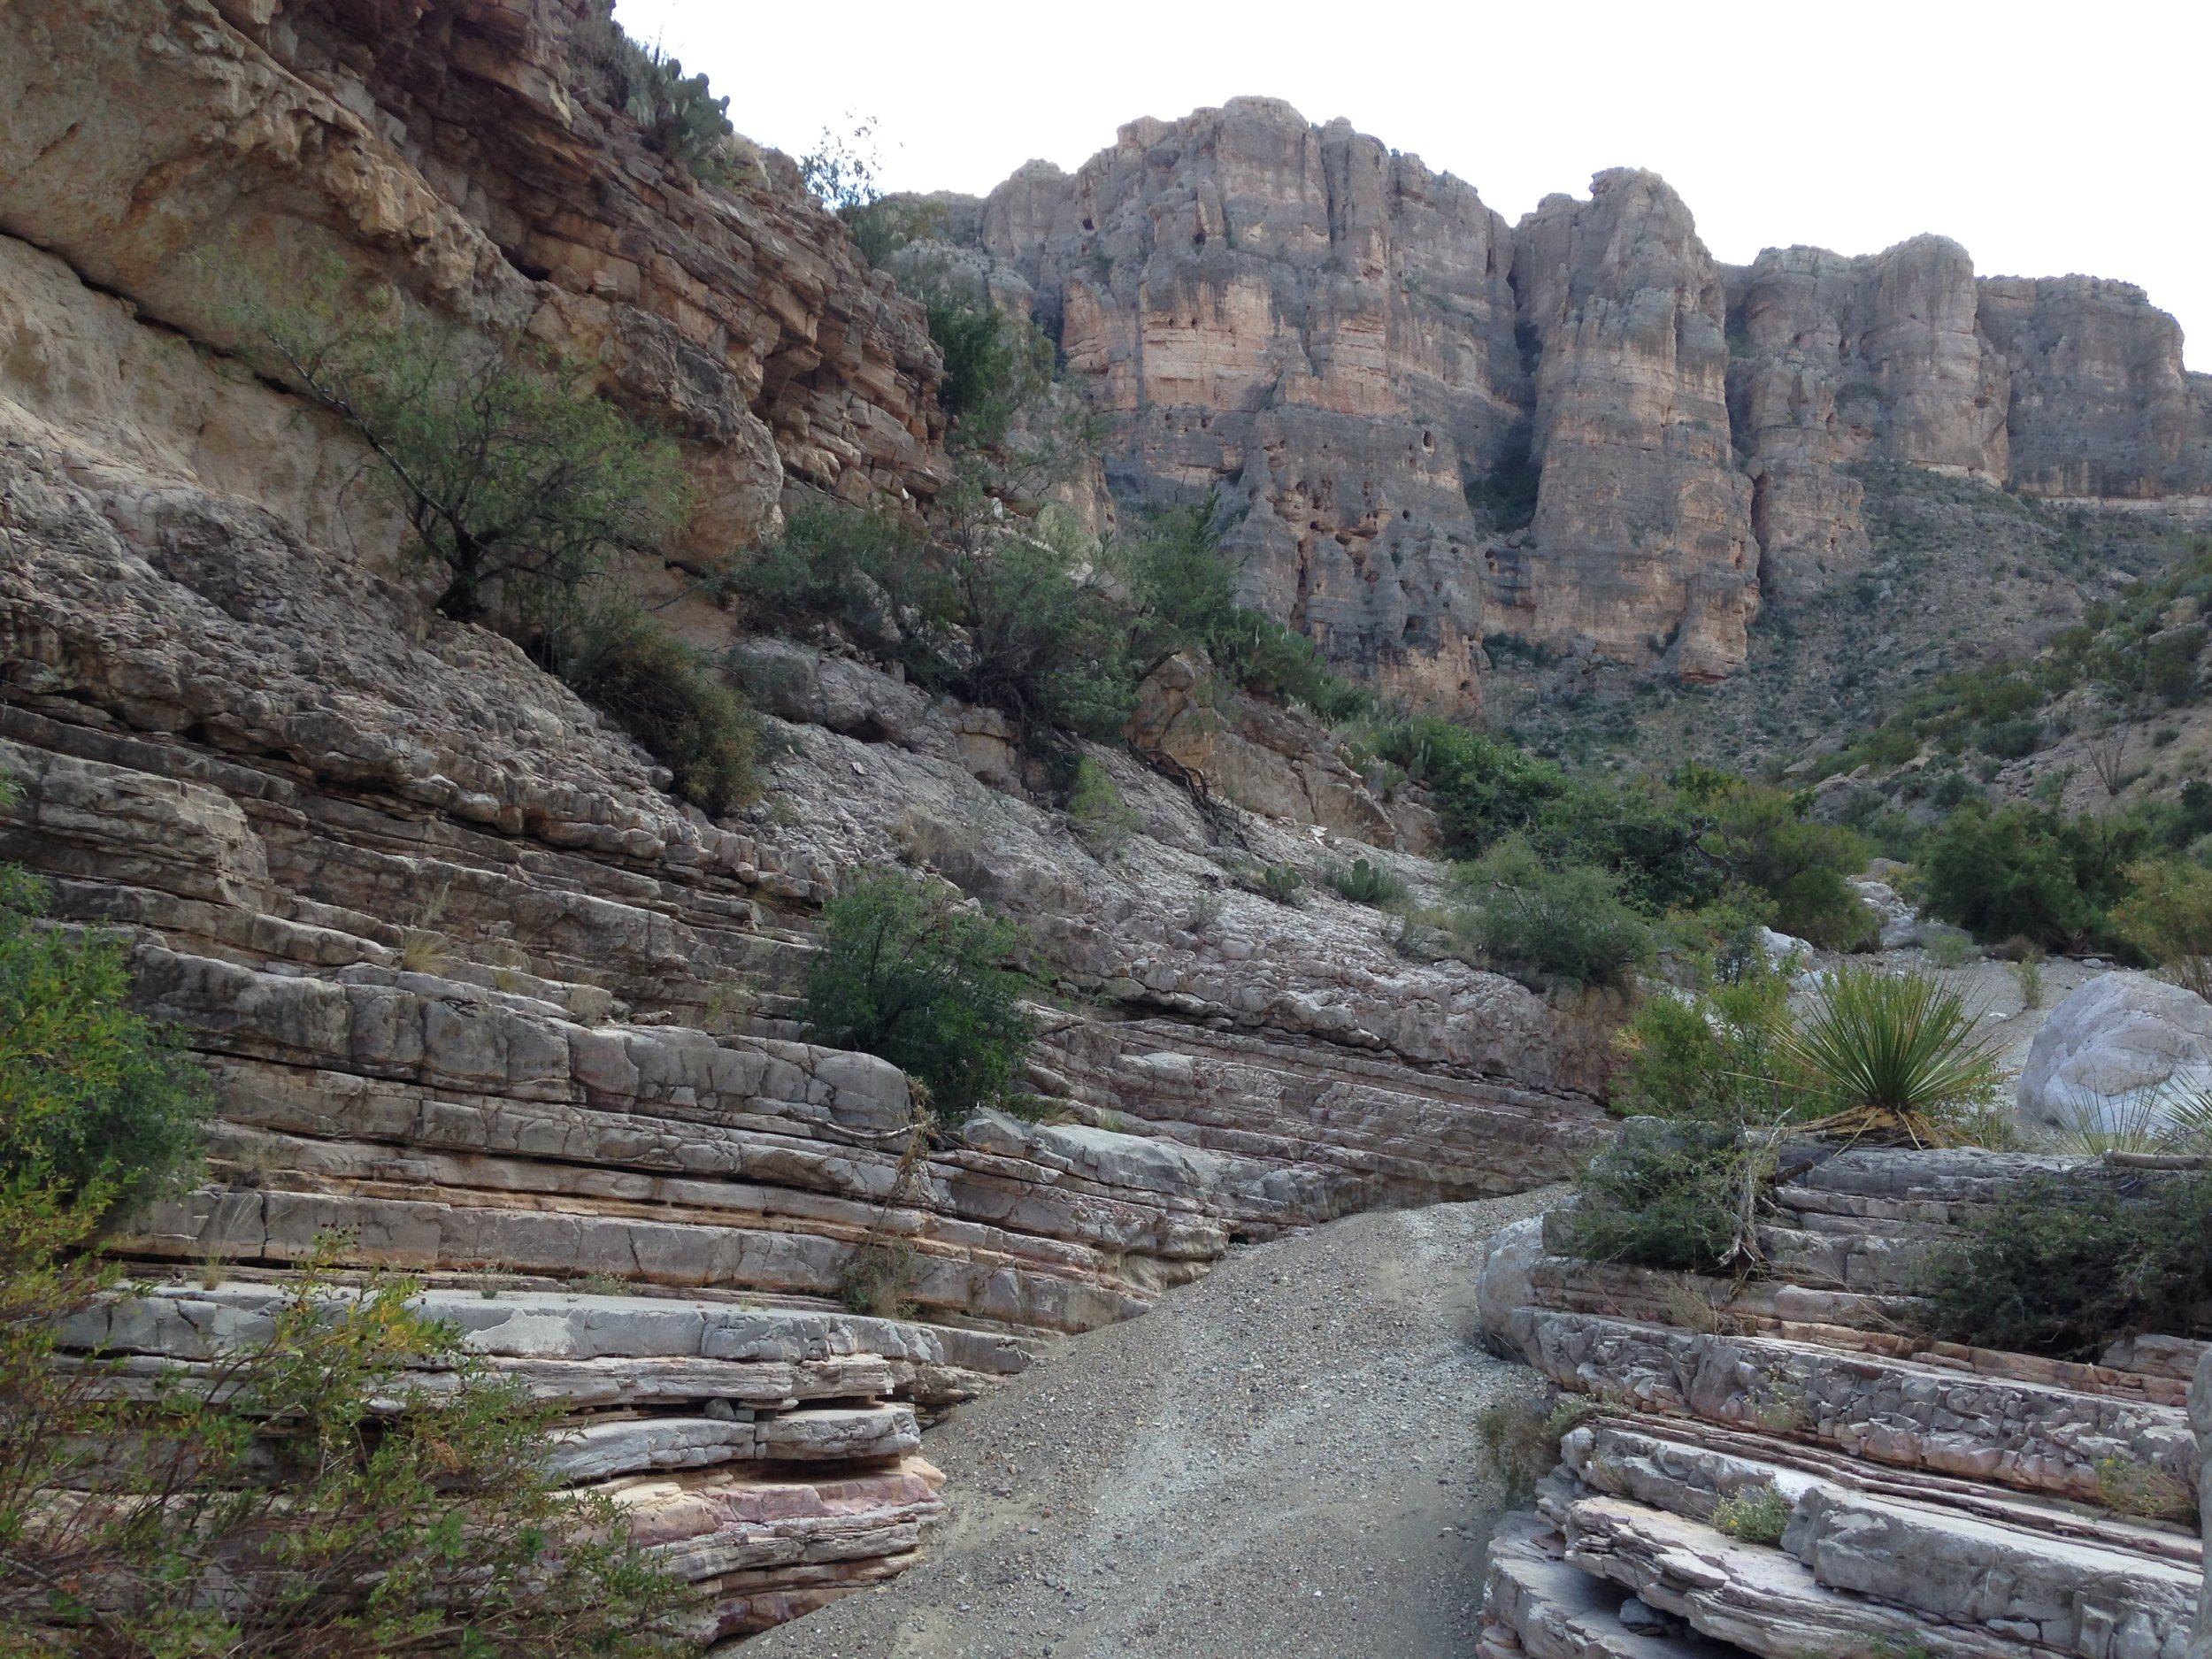 Canyon3.JPG